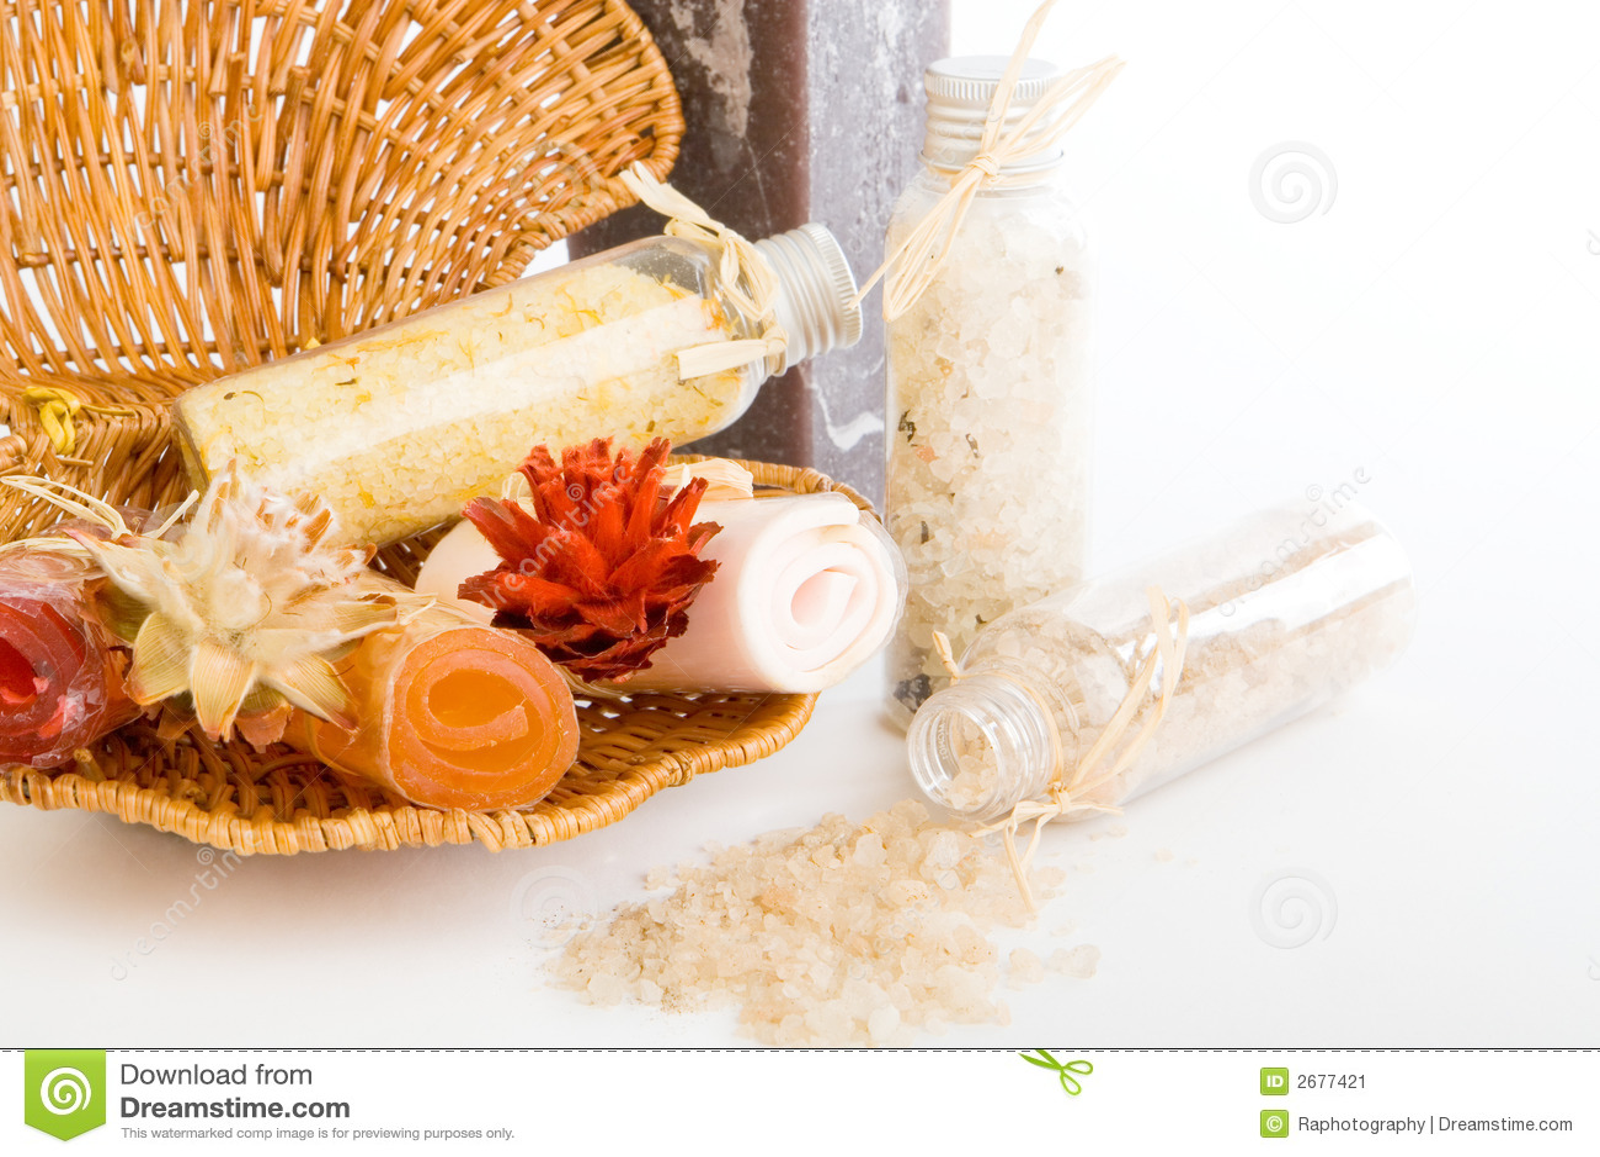 Bath salts with soap